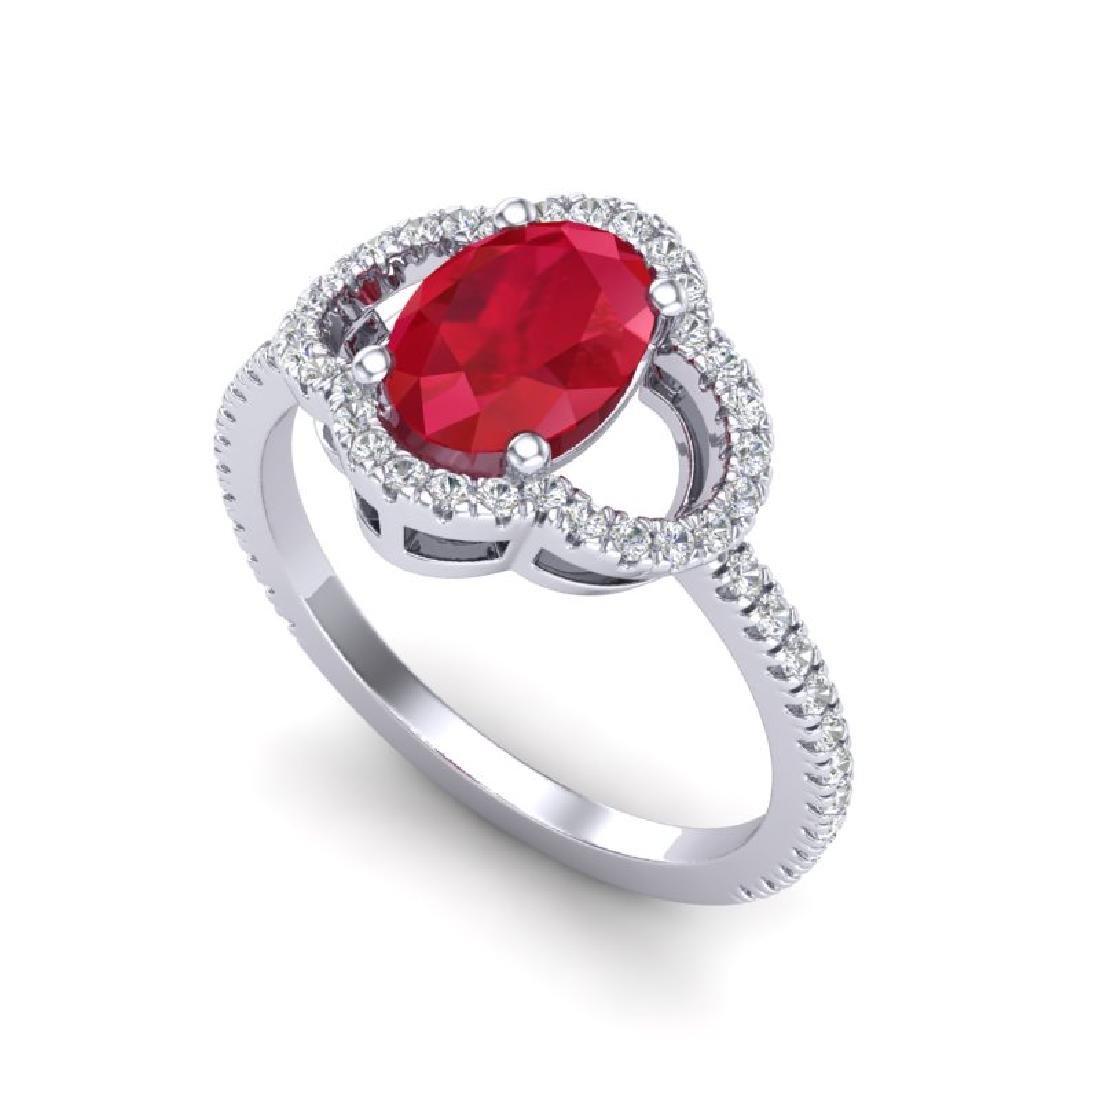 2 CTW Ruby & Micro Pave VS/SI Diamond Ring 10K White - 2